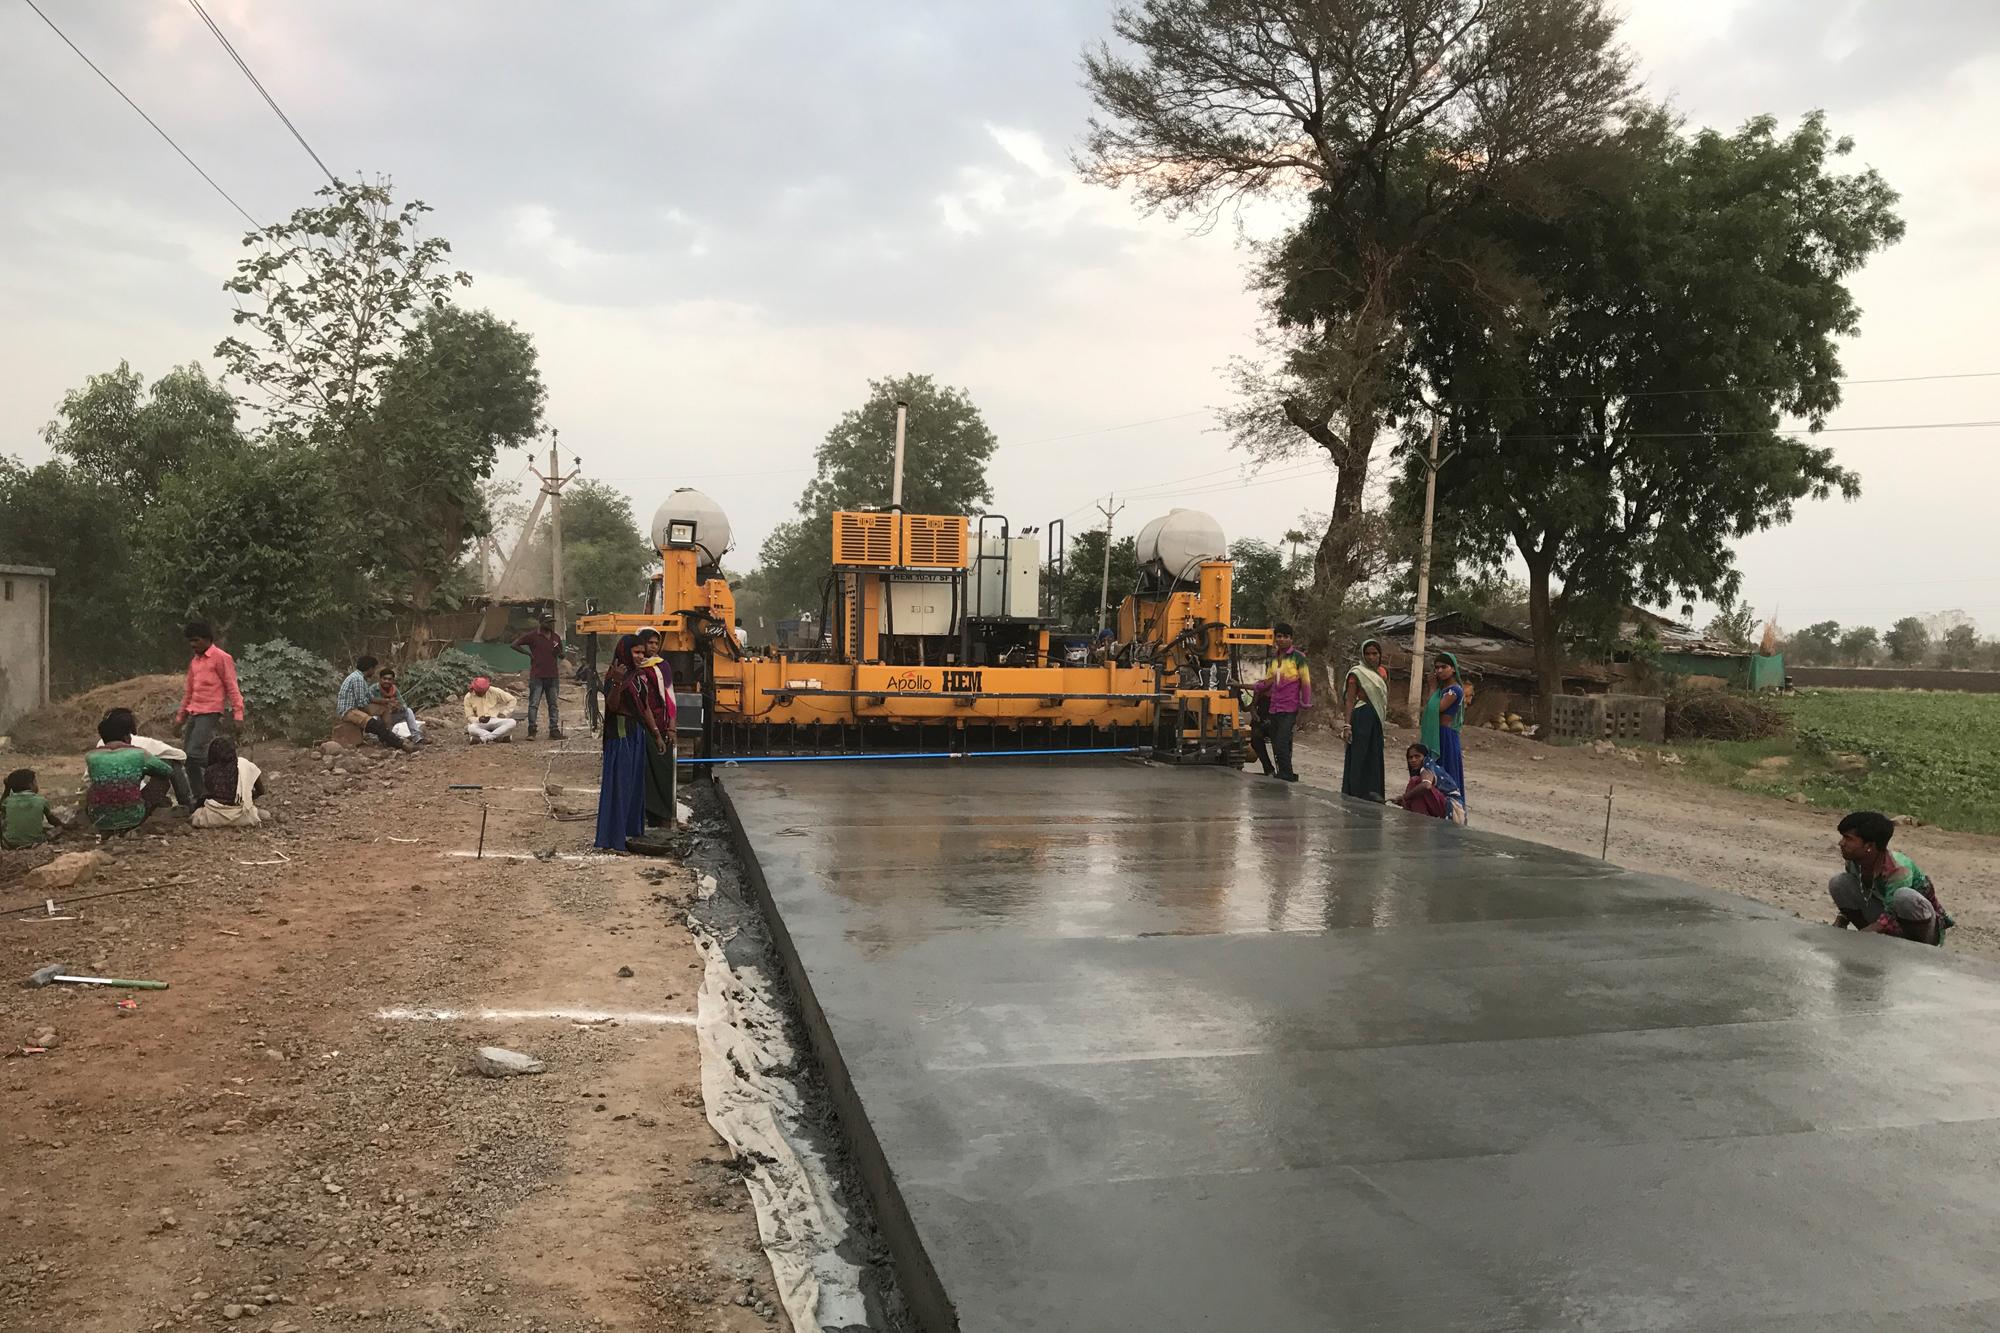 11 Smart Road Construction Equipment B2b Purchase